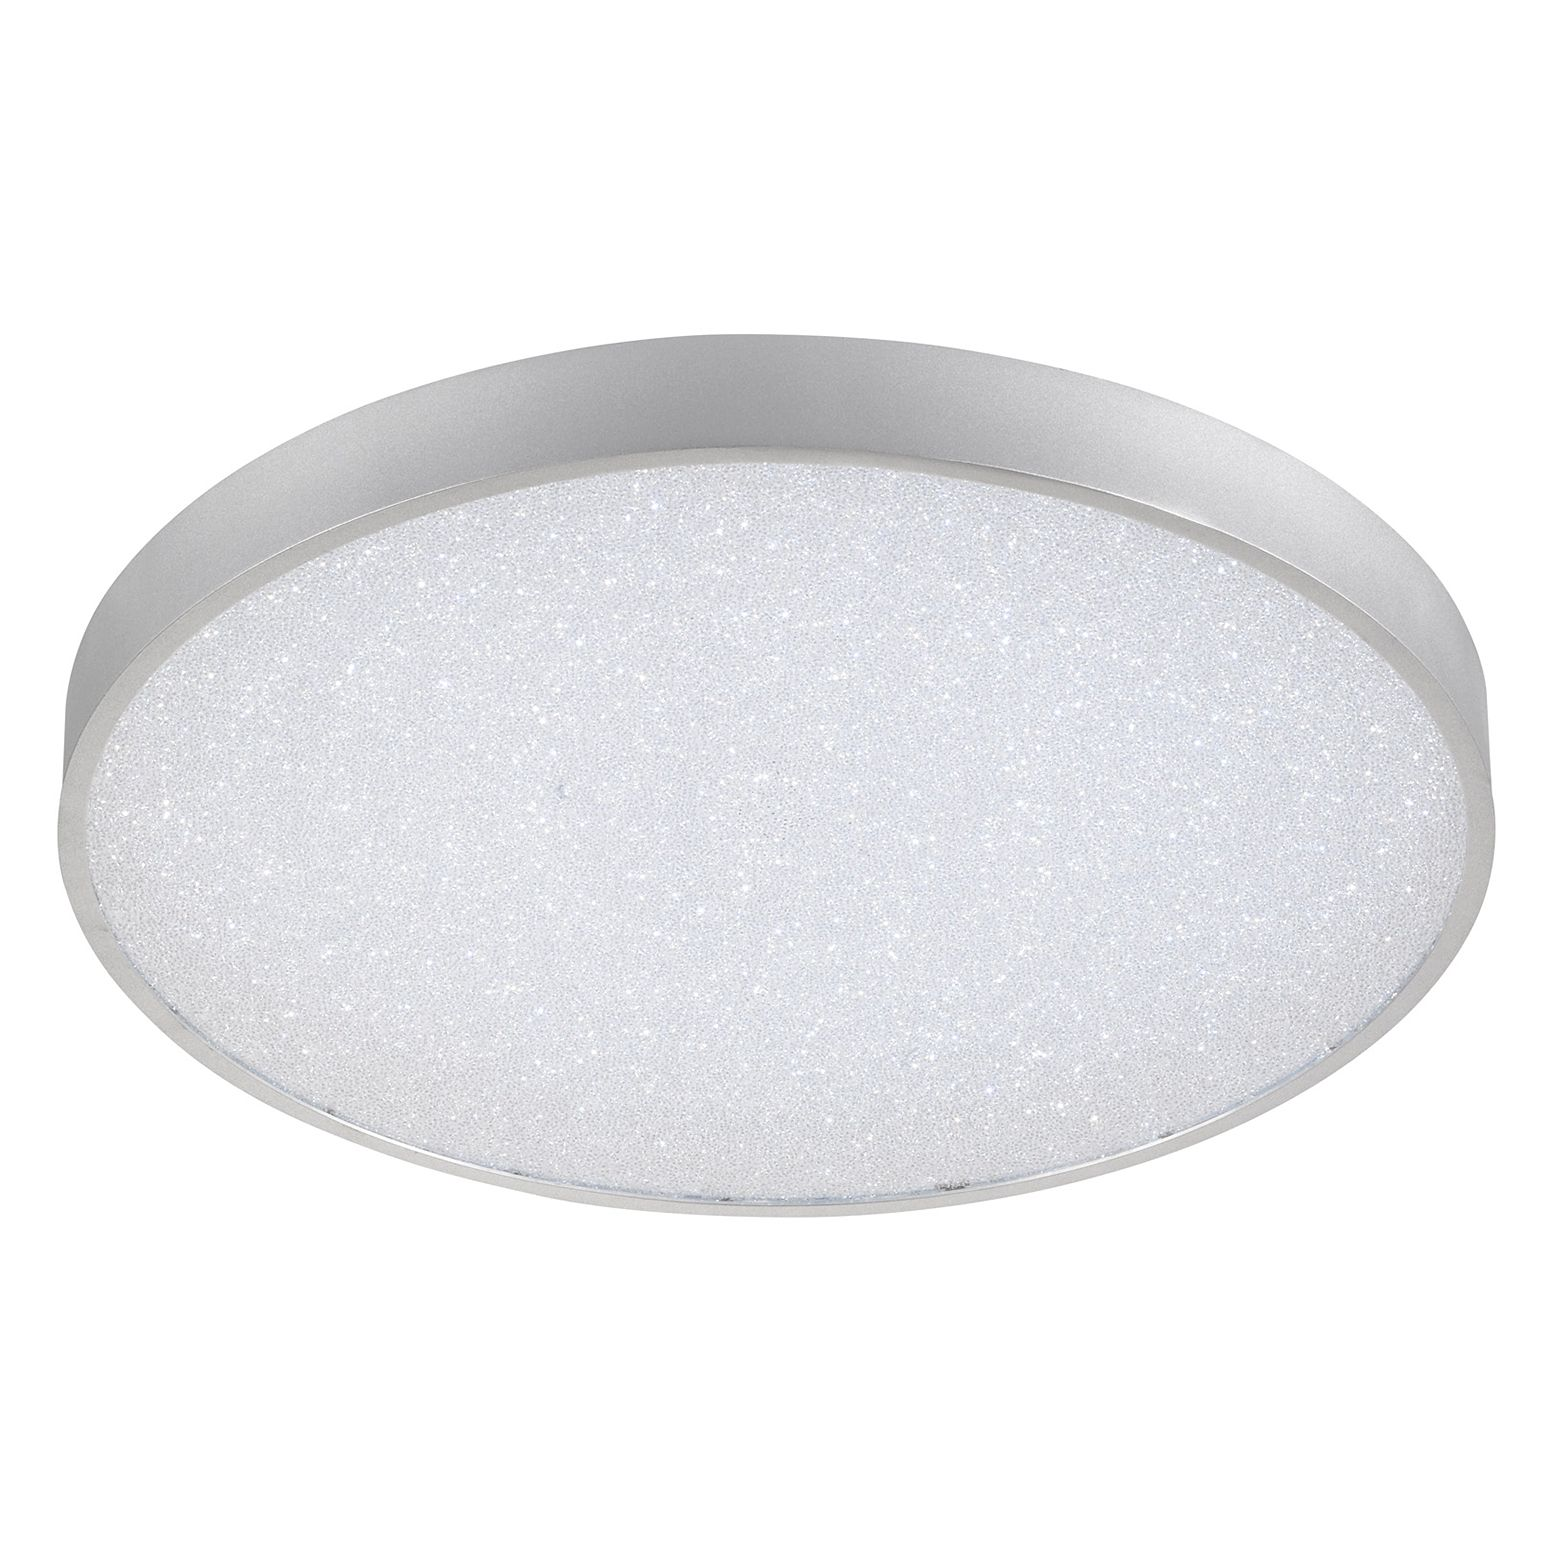 home24 LED-Deckenleuchte Glam I